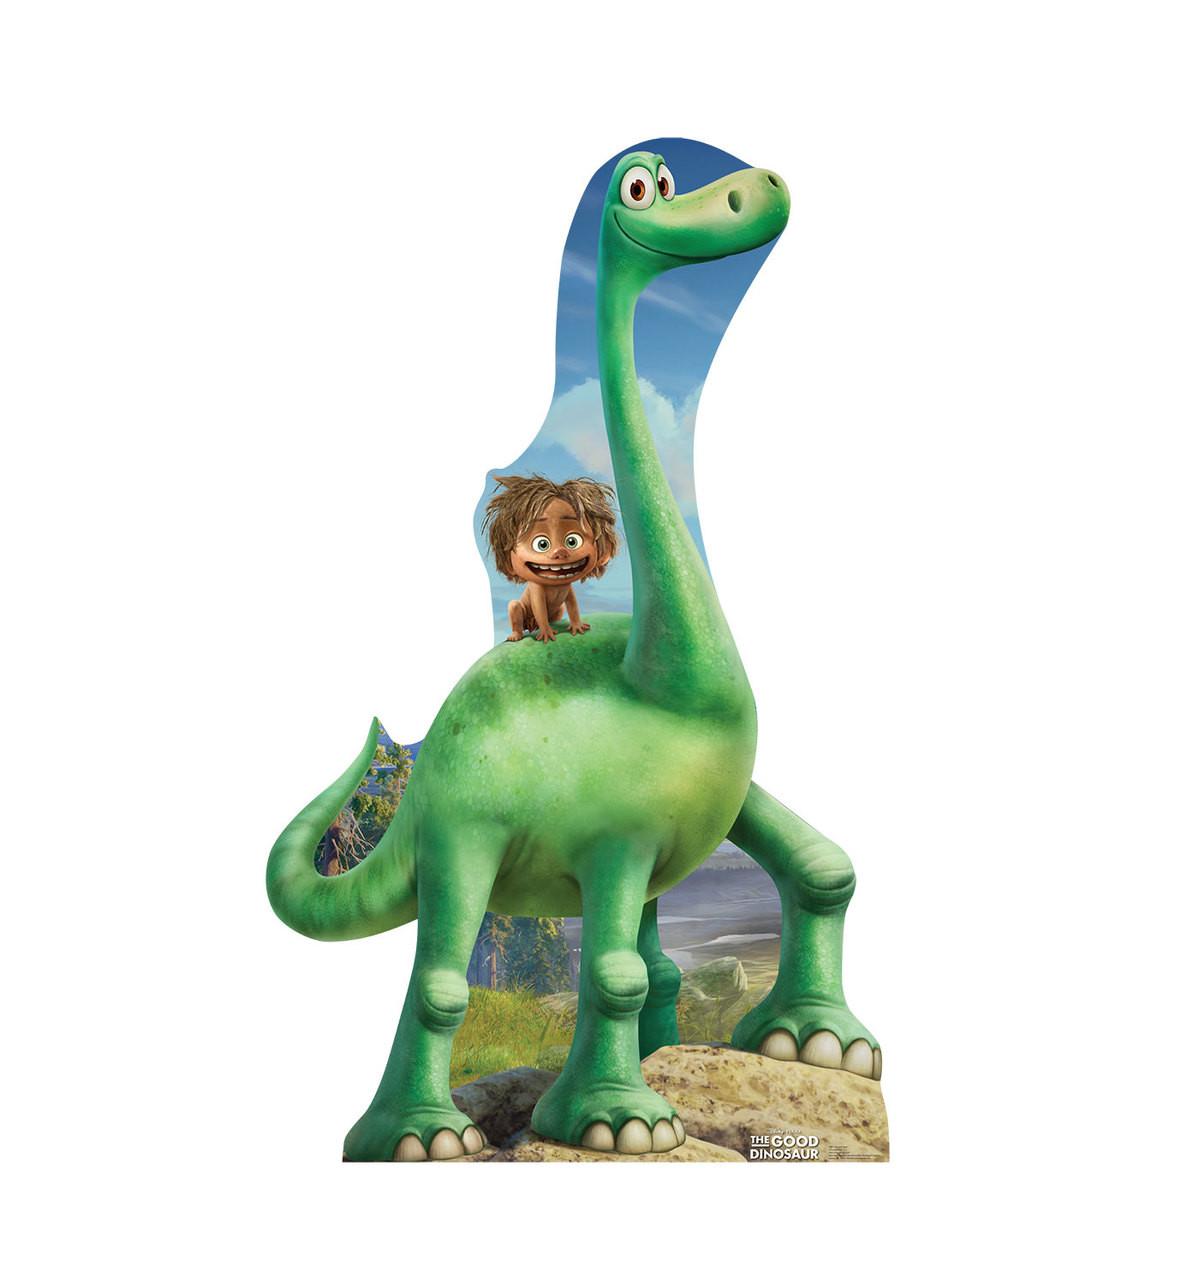 Life-size Arlo and Spot - The Good Dinosaur Cardboard Standup